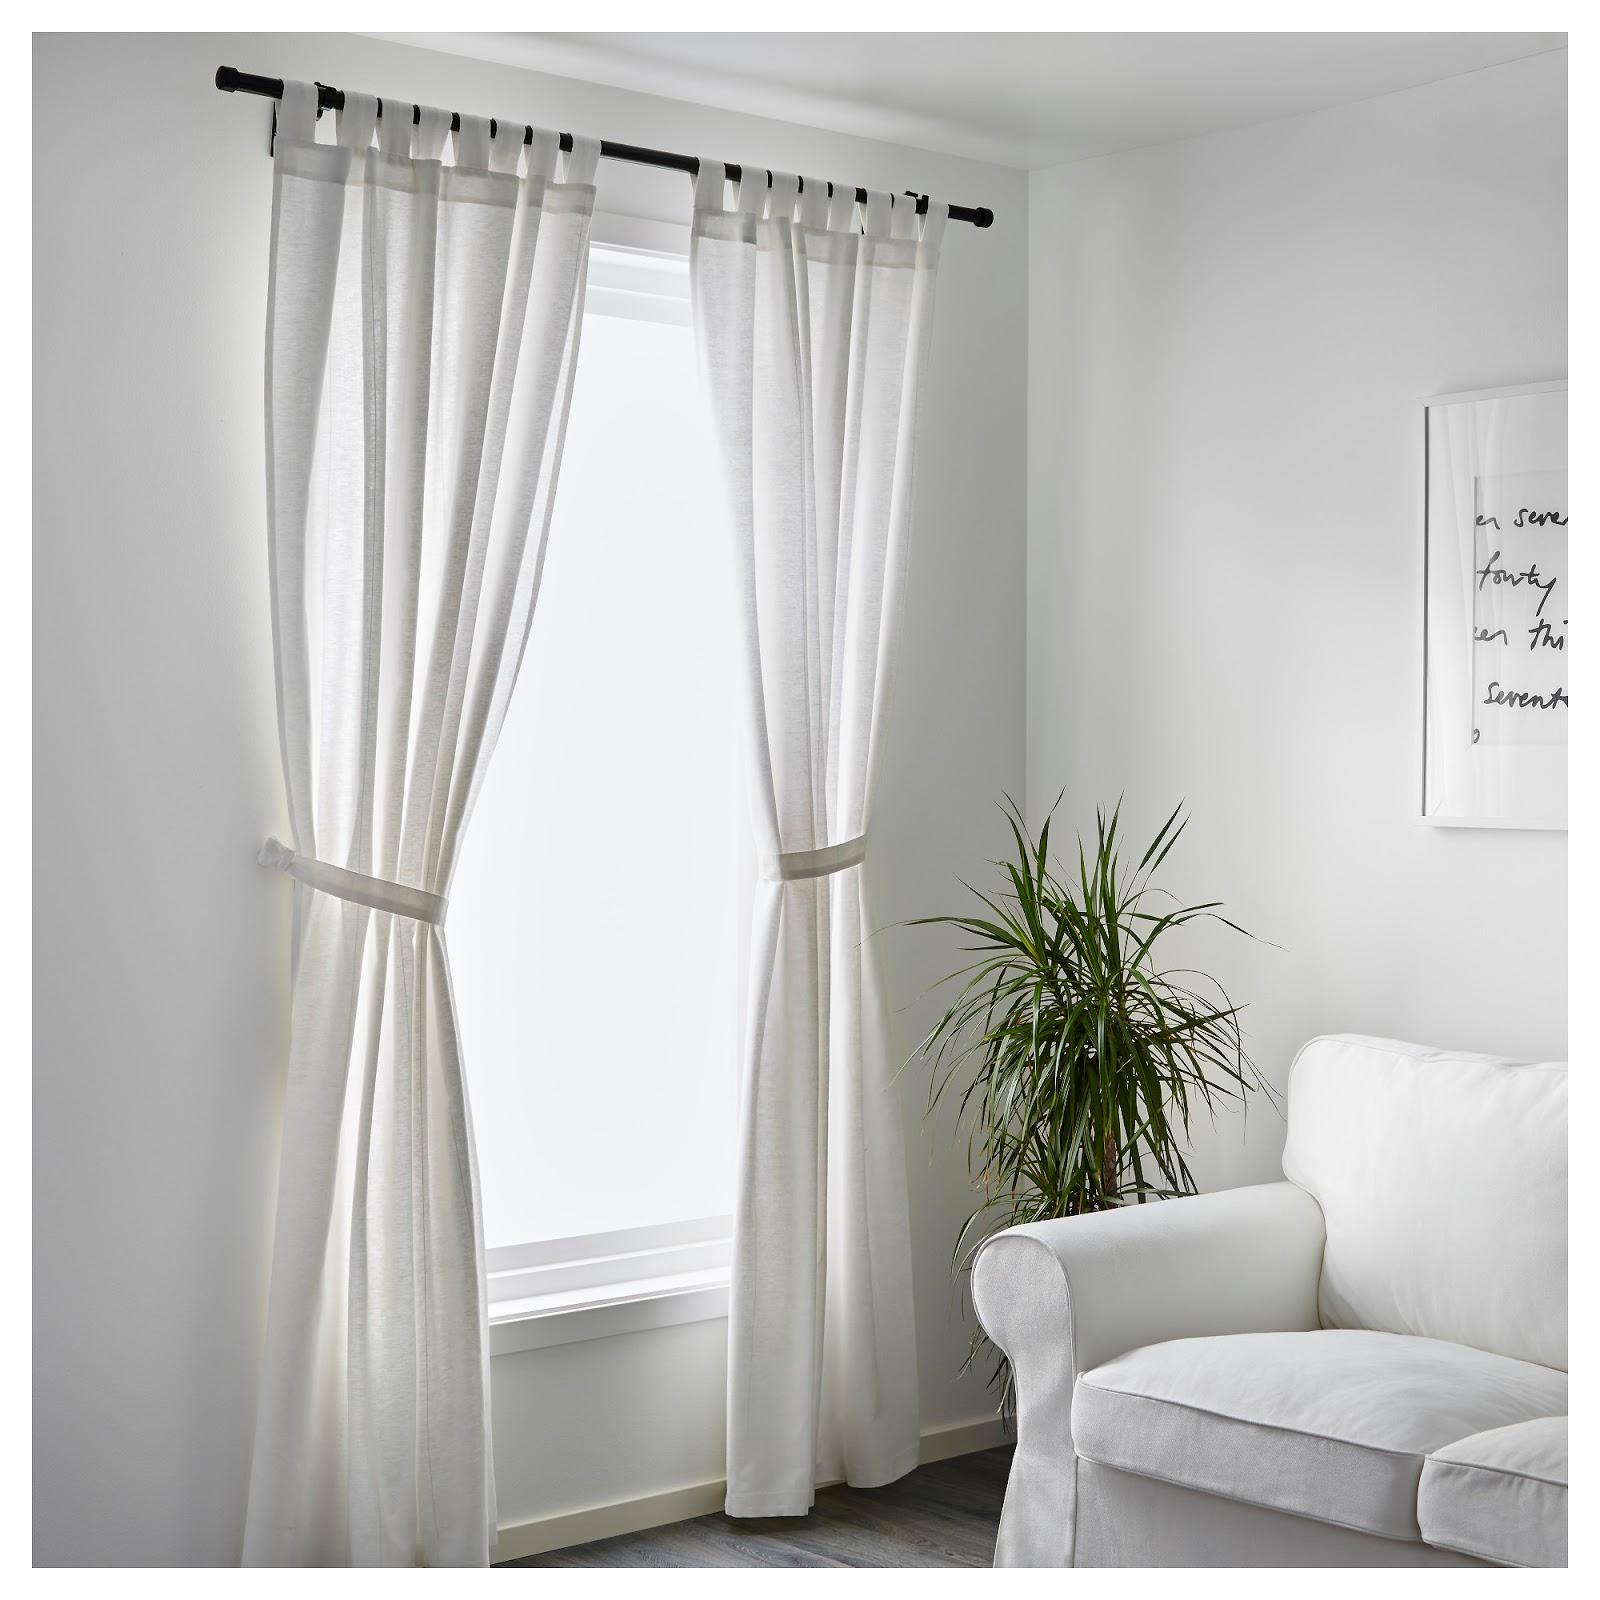 Half Circle Curtain Rod Shower Window Curtains Door